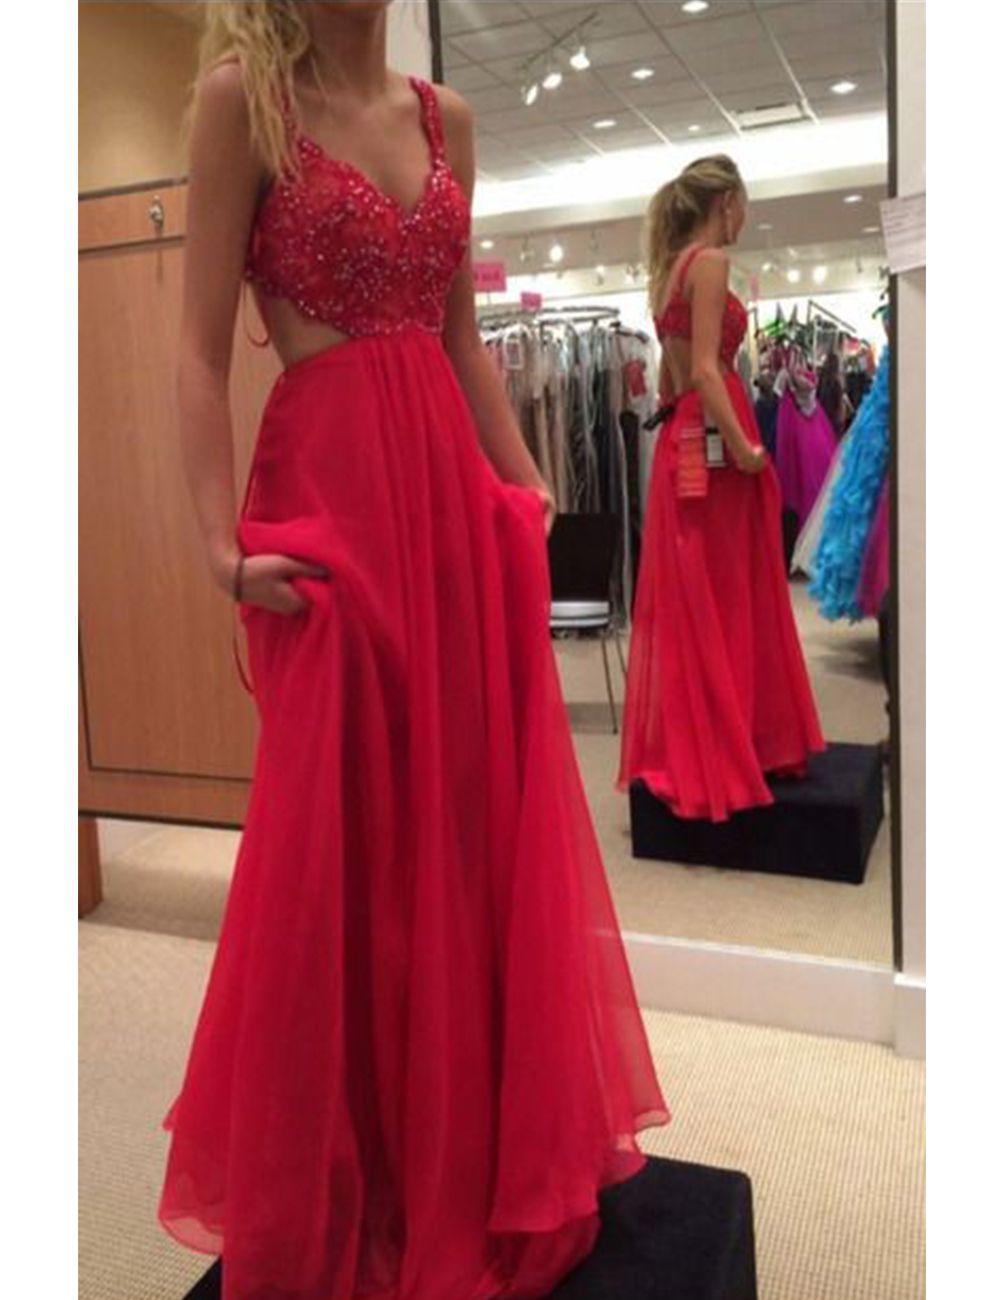 Red Prom Dress,Beaded Prom Dress,Backless Prom Dress,Fashion Prom ...